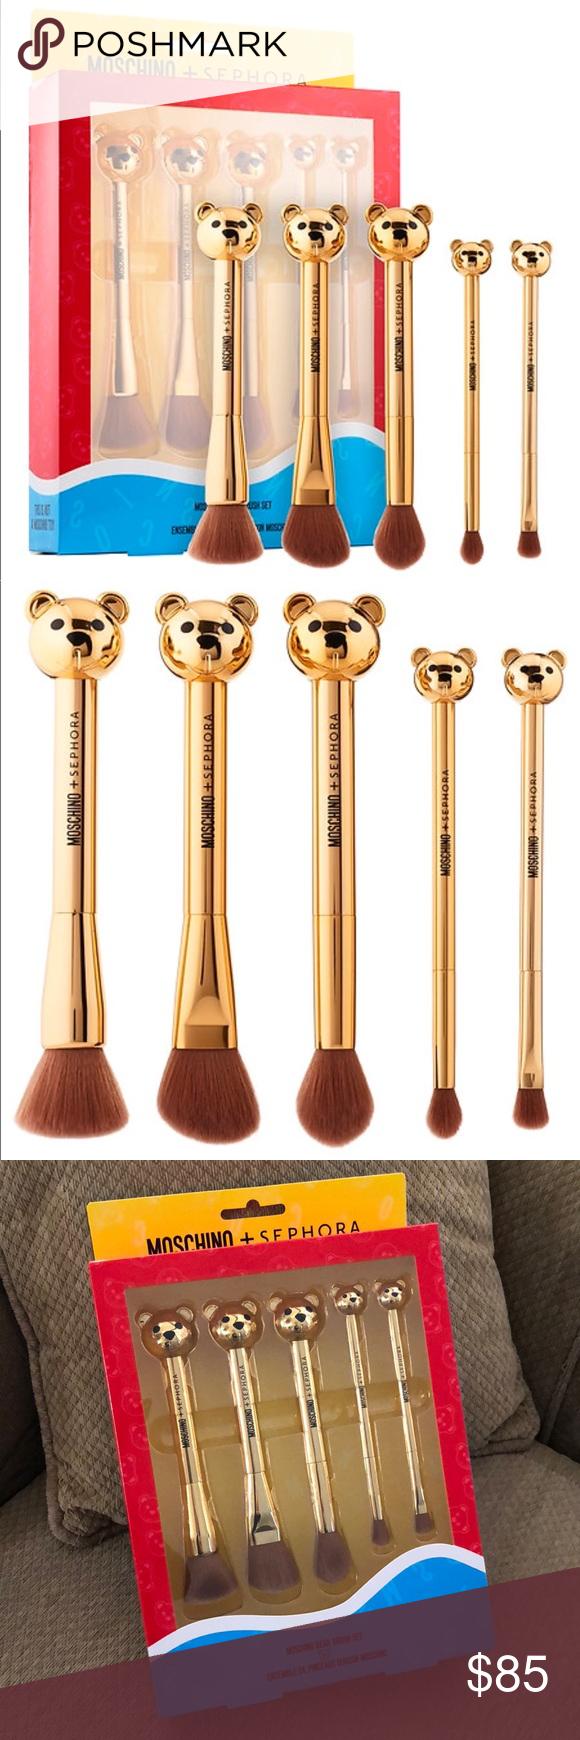 Moschino + Sephora Bear Brush Set NWT Sephora makeup